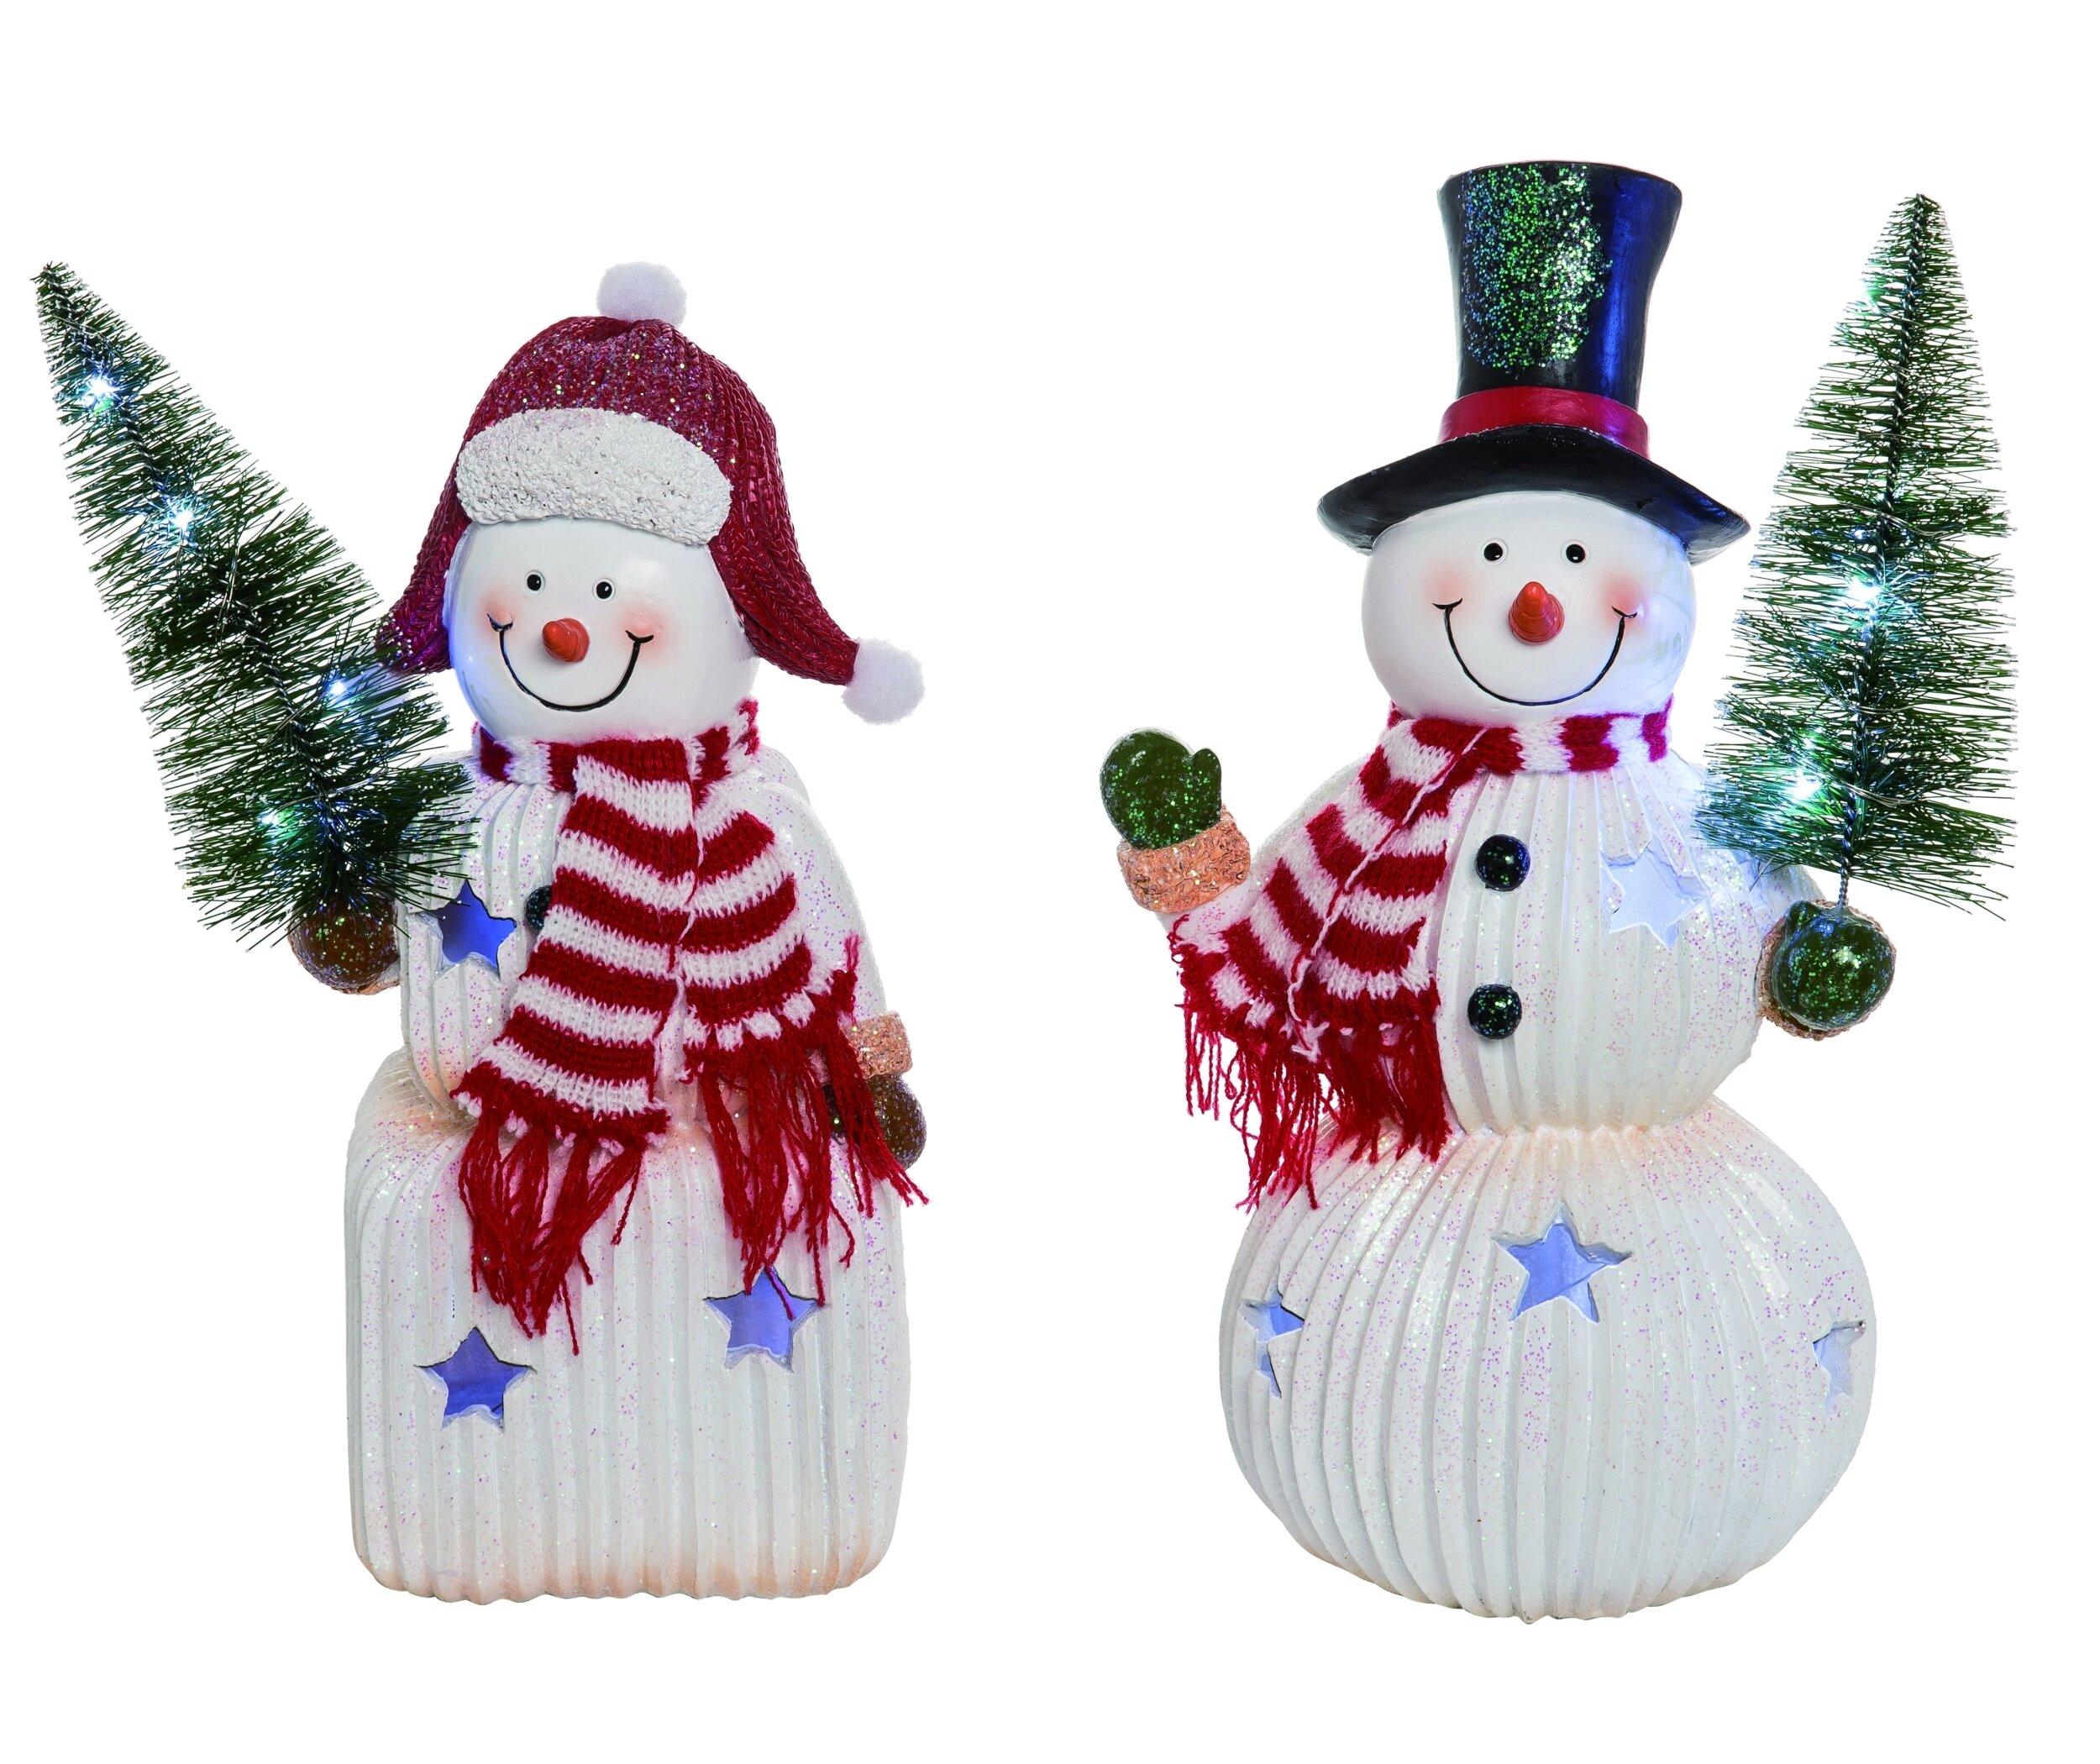 The Holiday Aisle 2 Piece Resin Christmas Light Up Cheerful Snowman Set Wayfair